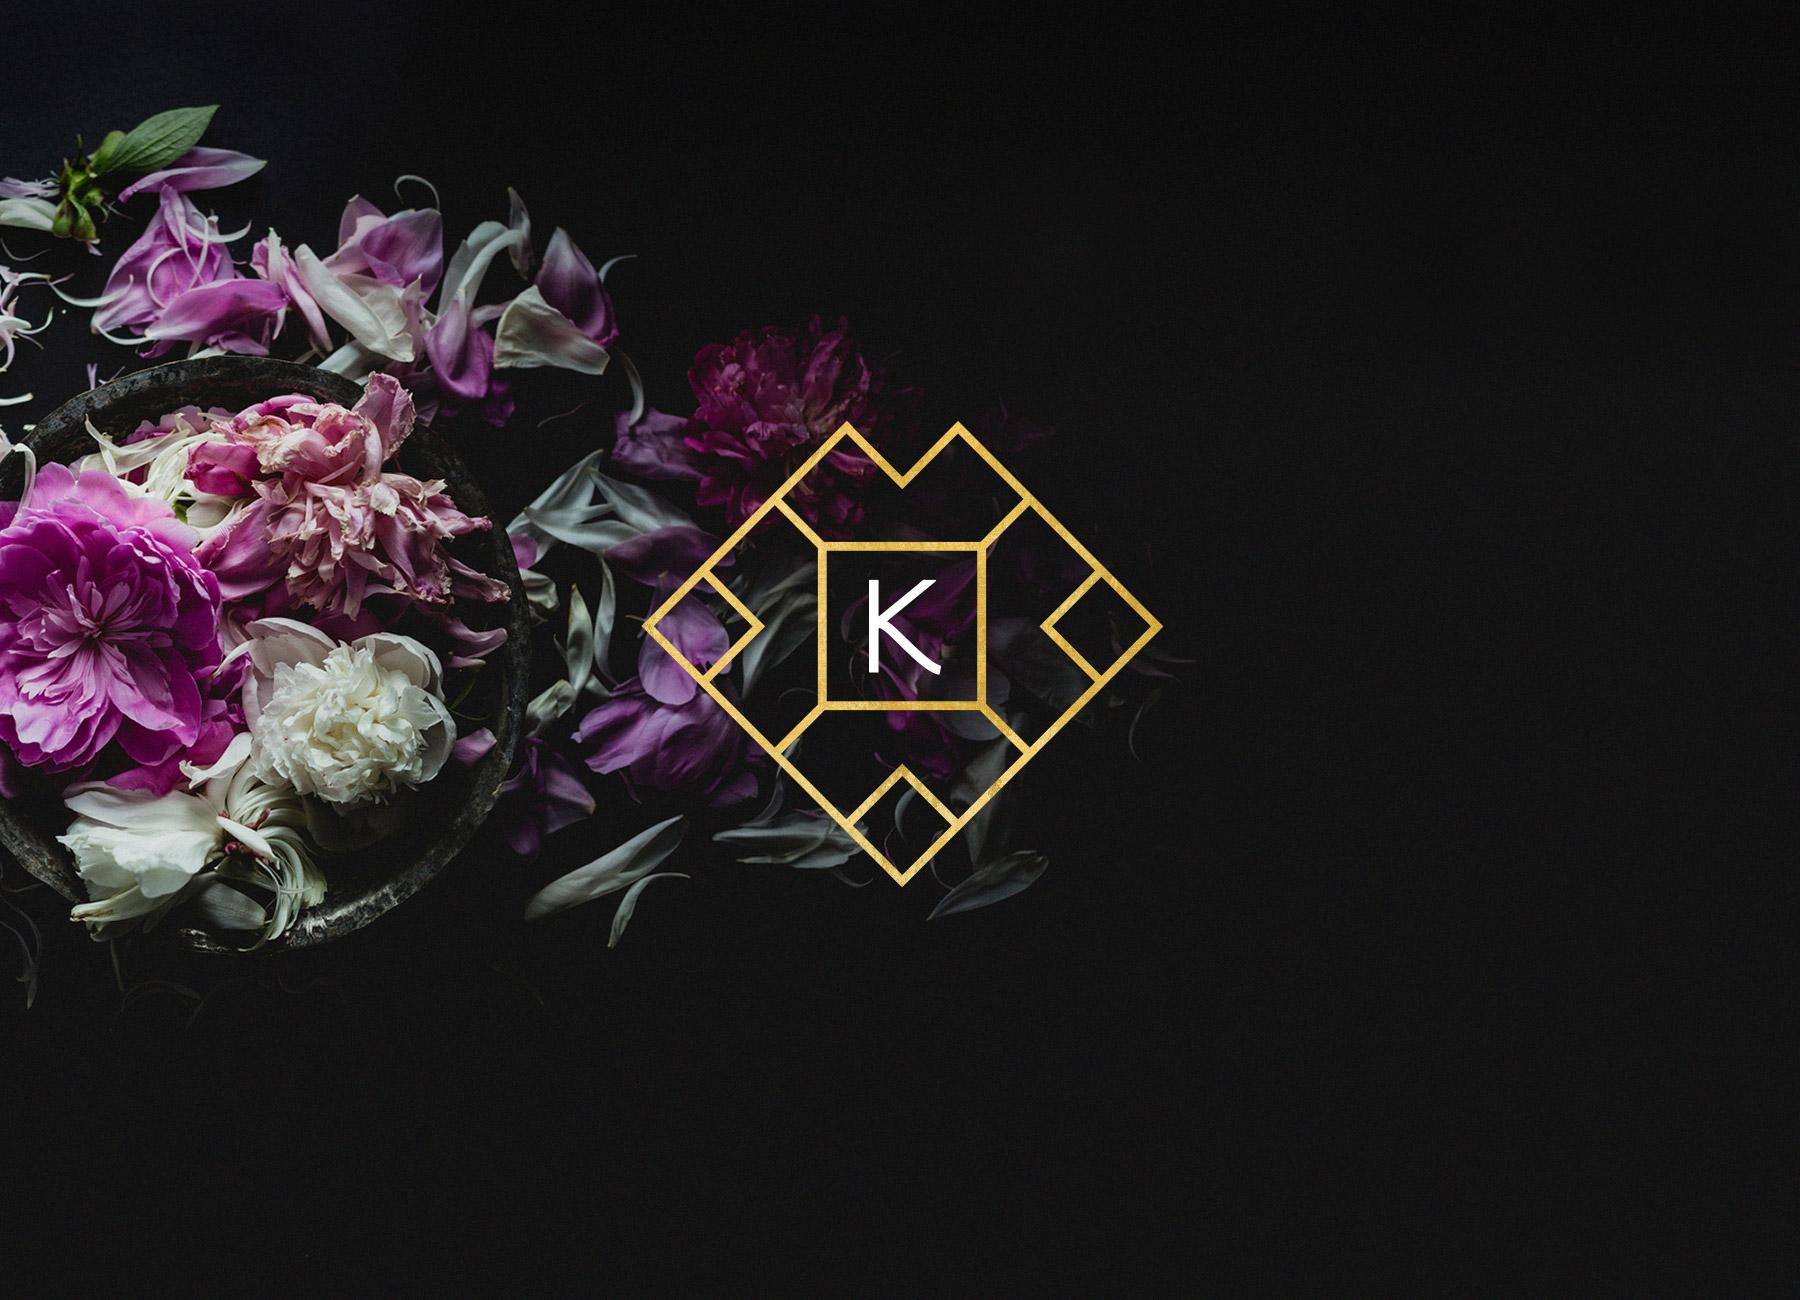 WE_ARE_BRANCH_KATE_ECKMAN_BRAND_WEB_DESIGN_0